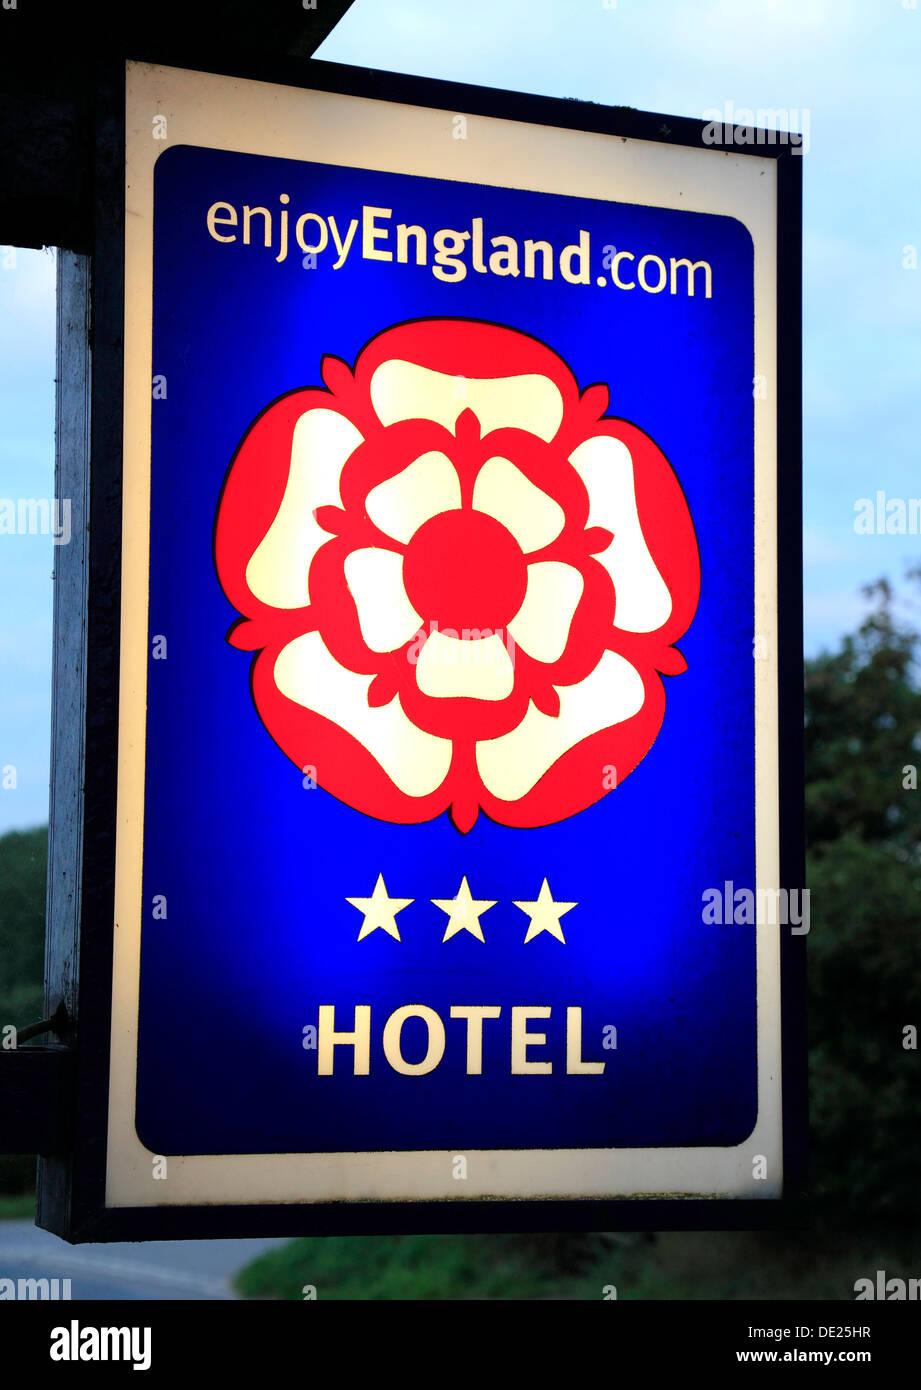 A est dell'Inghilterra, 3 stelle, stelle, segno, rating UK Immagini Stock